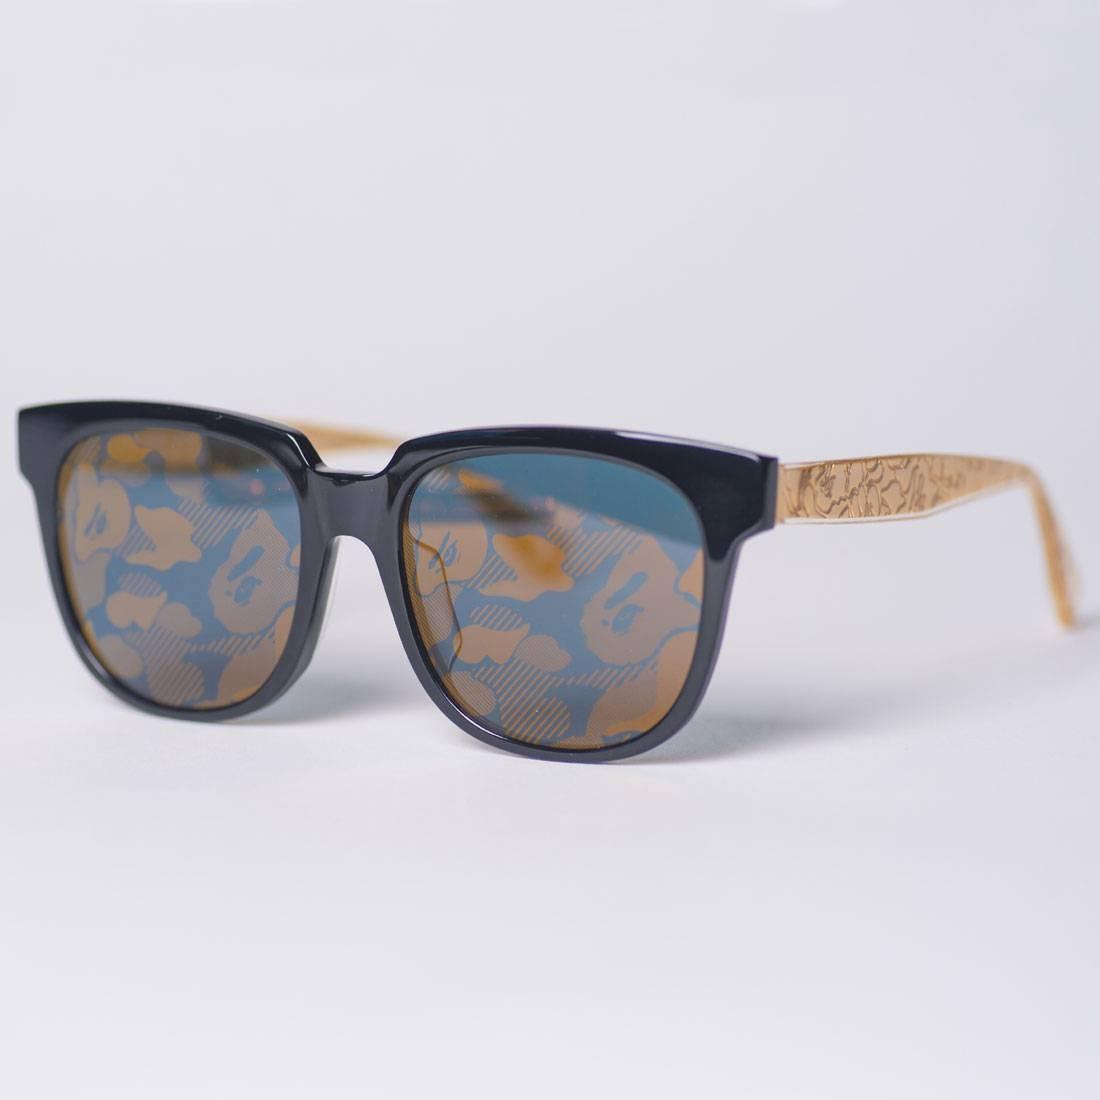 A Bathing Ape BS13073 BG Sunglasses - 2017 New Year Edition (black / gold)